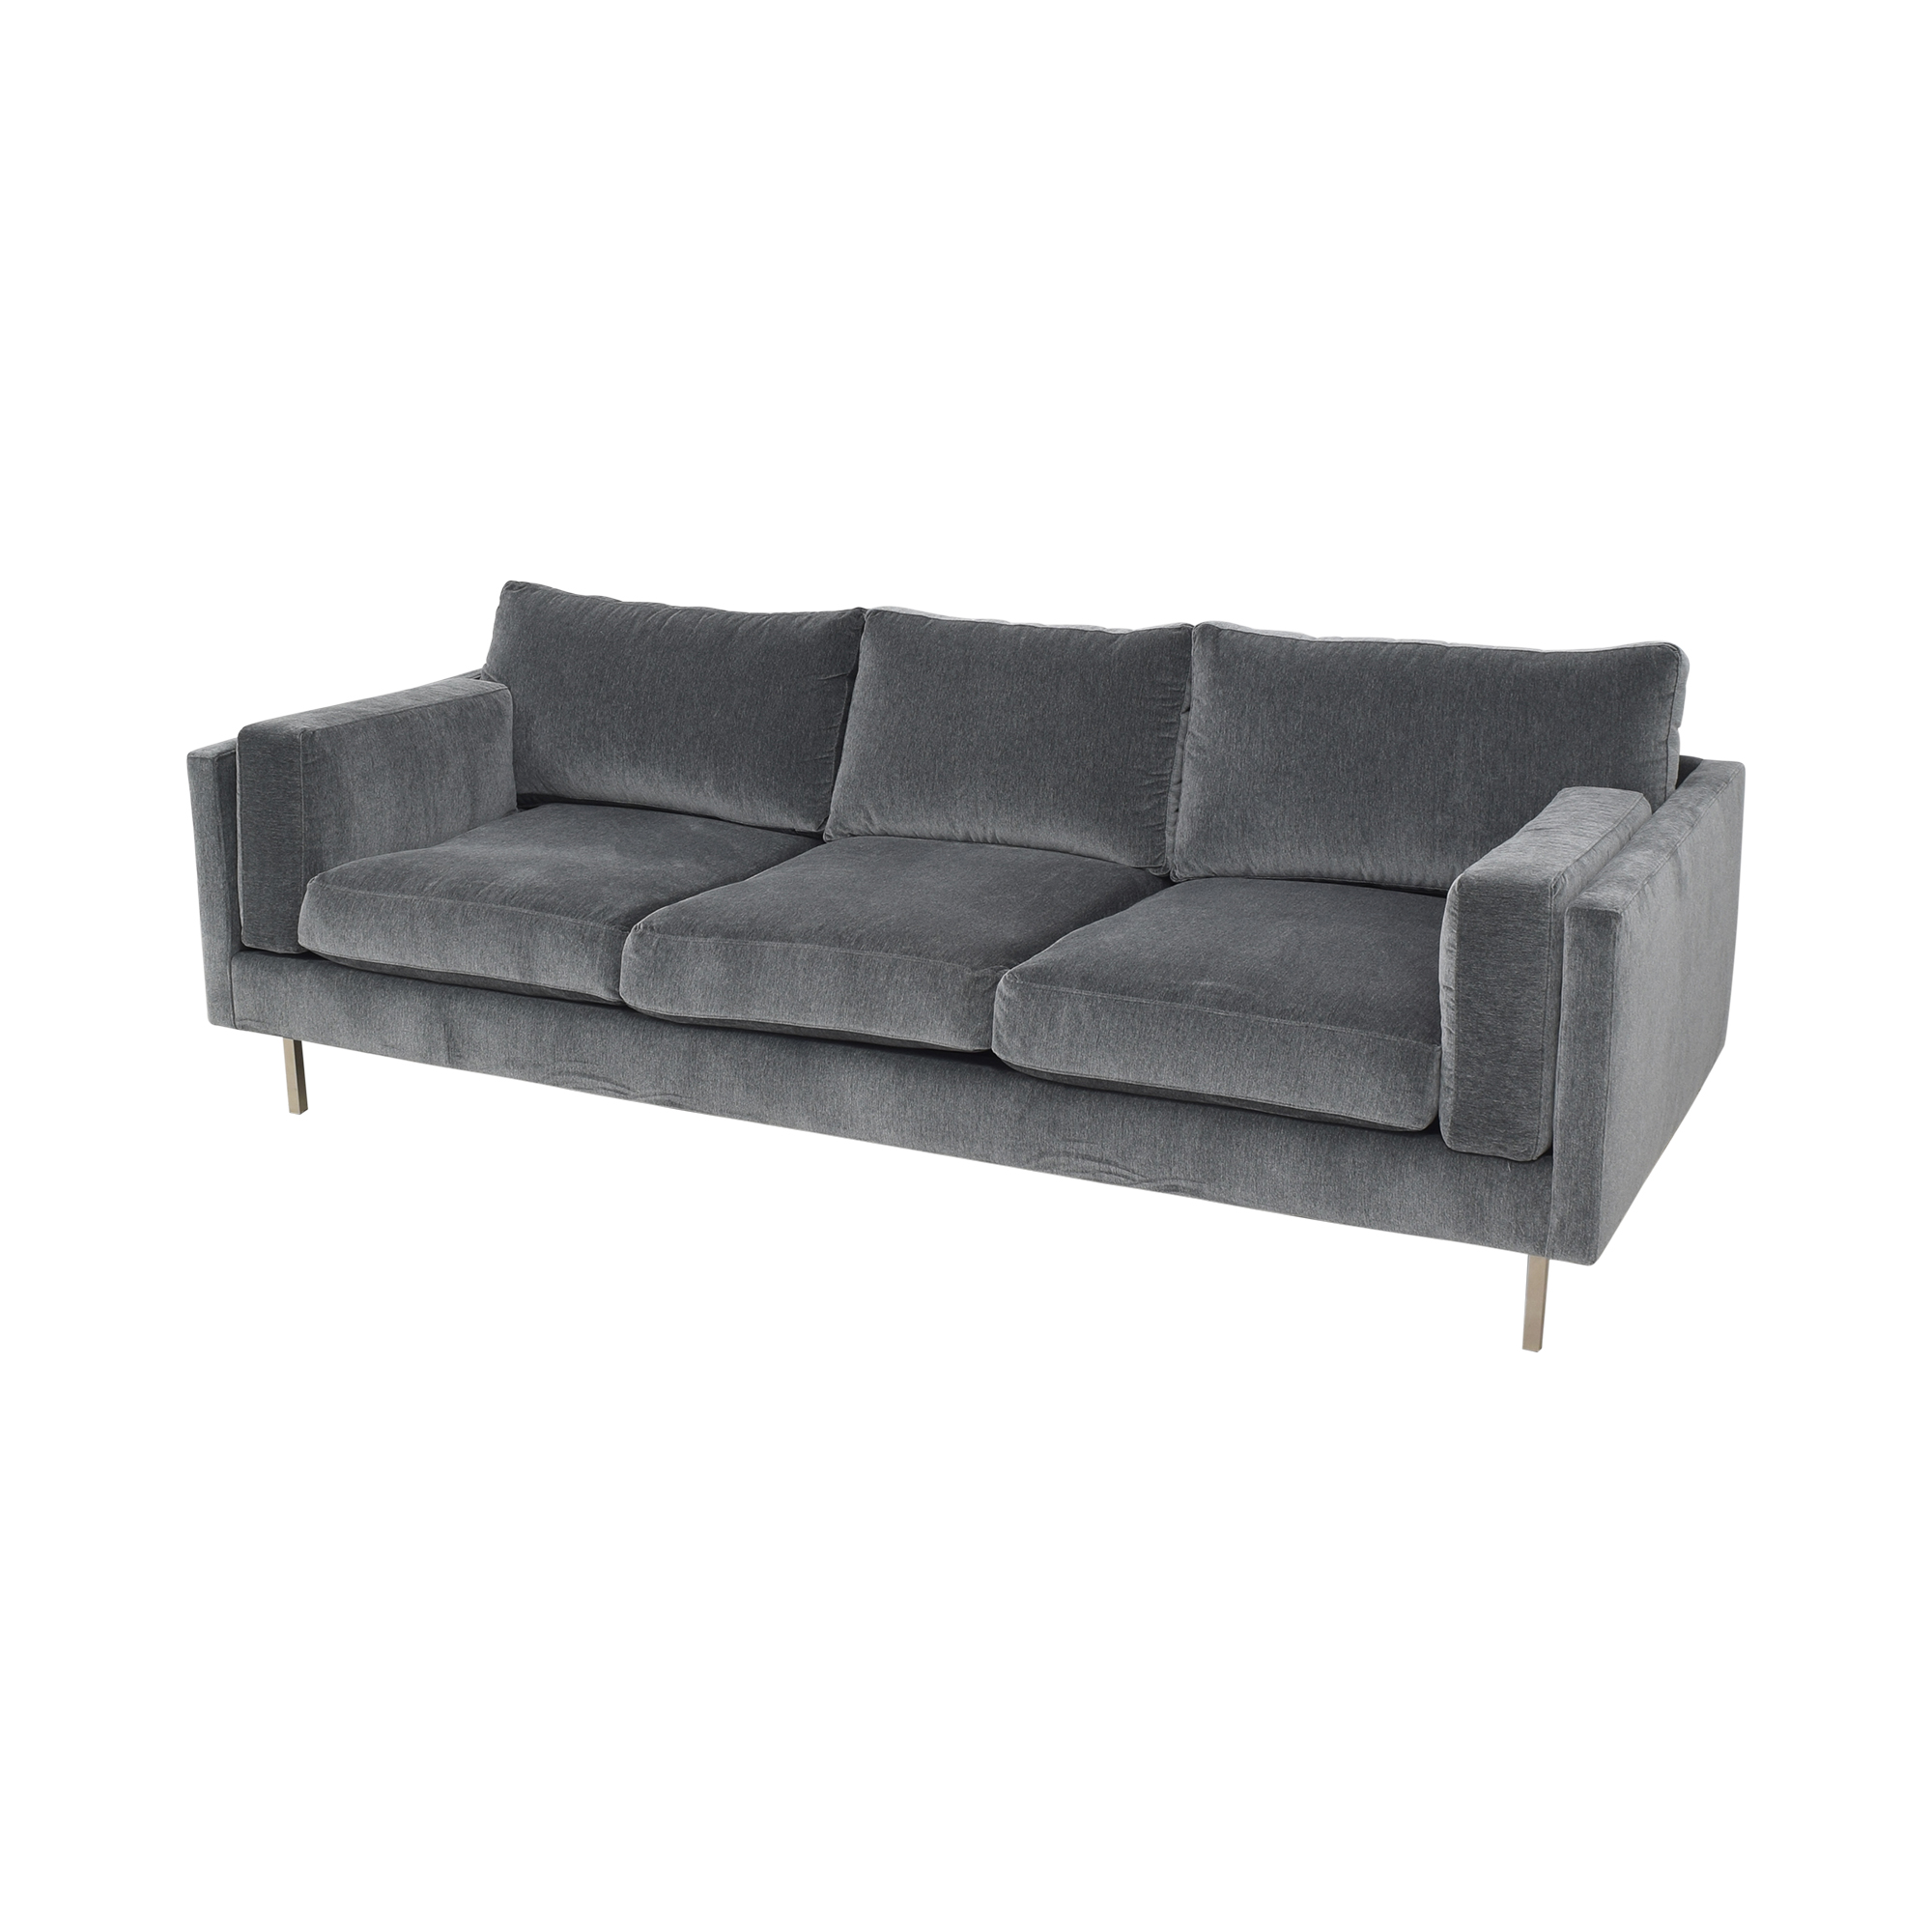 BenchMade Modern BenchMade Modern Skinny Fat Sofa nj